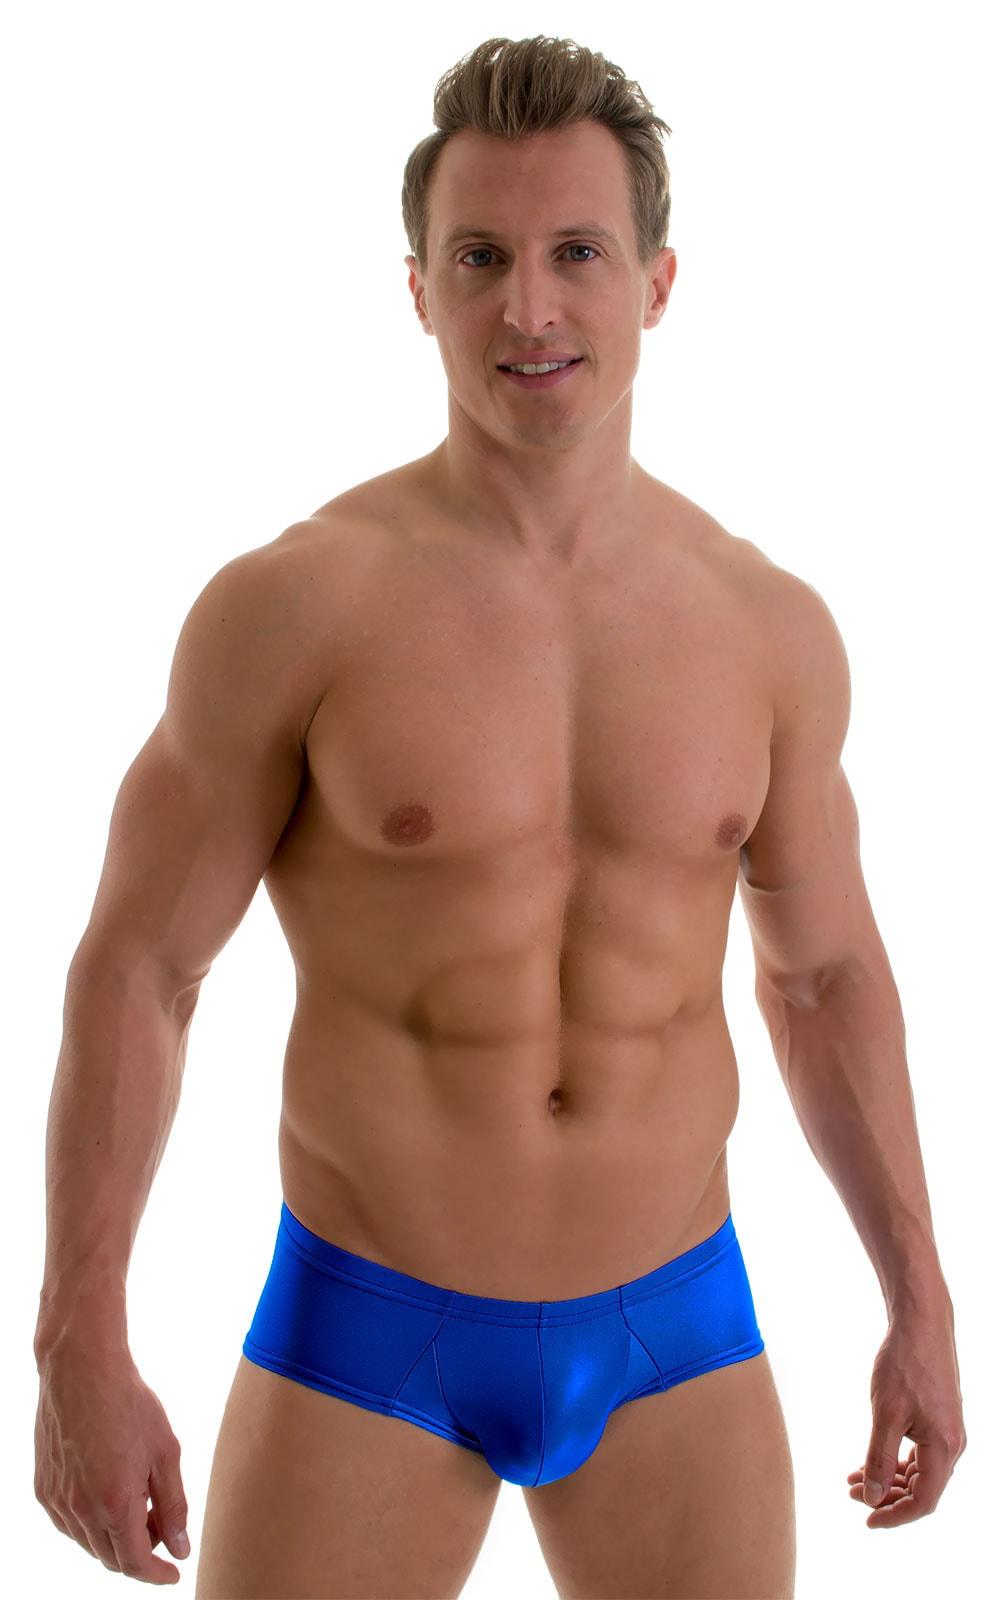 Pouch Enhanced Micro Swim Trunks in Royal Blue 1